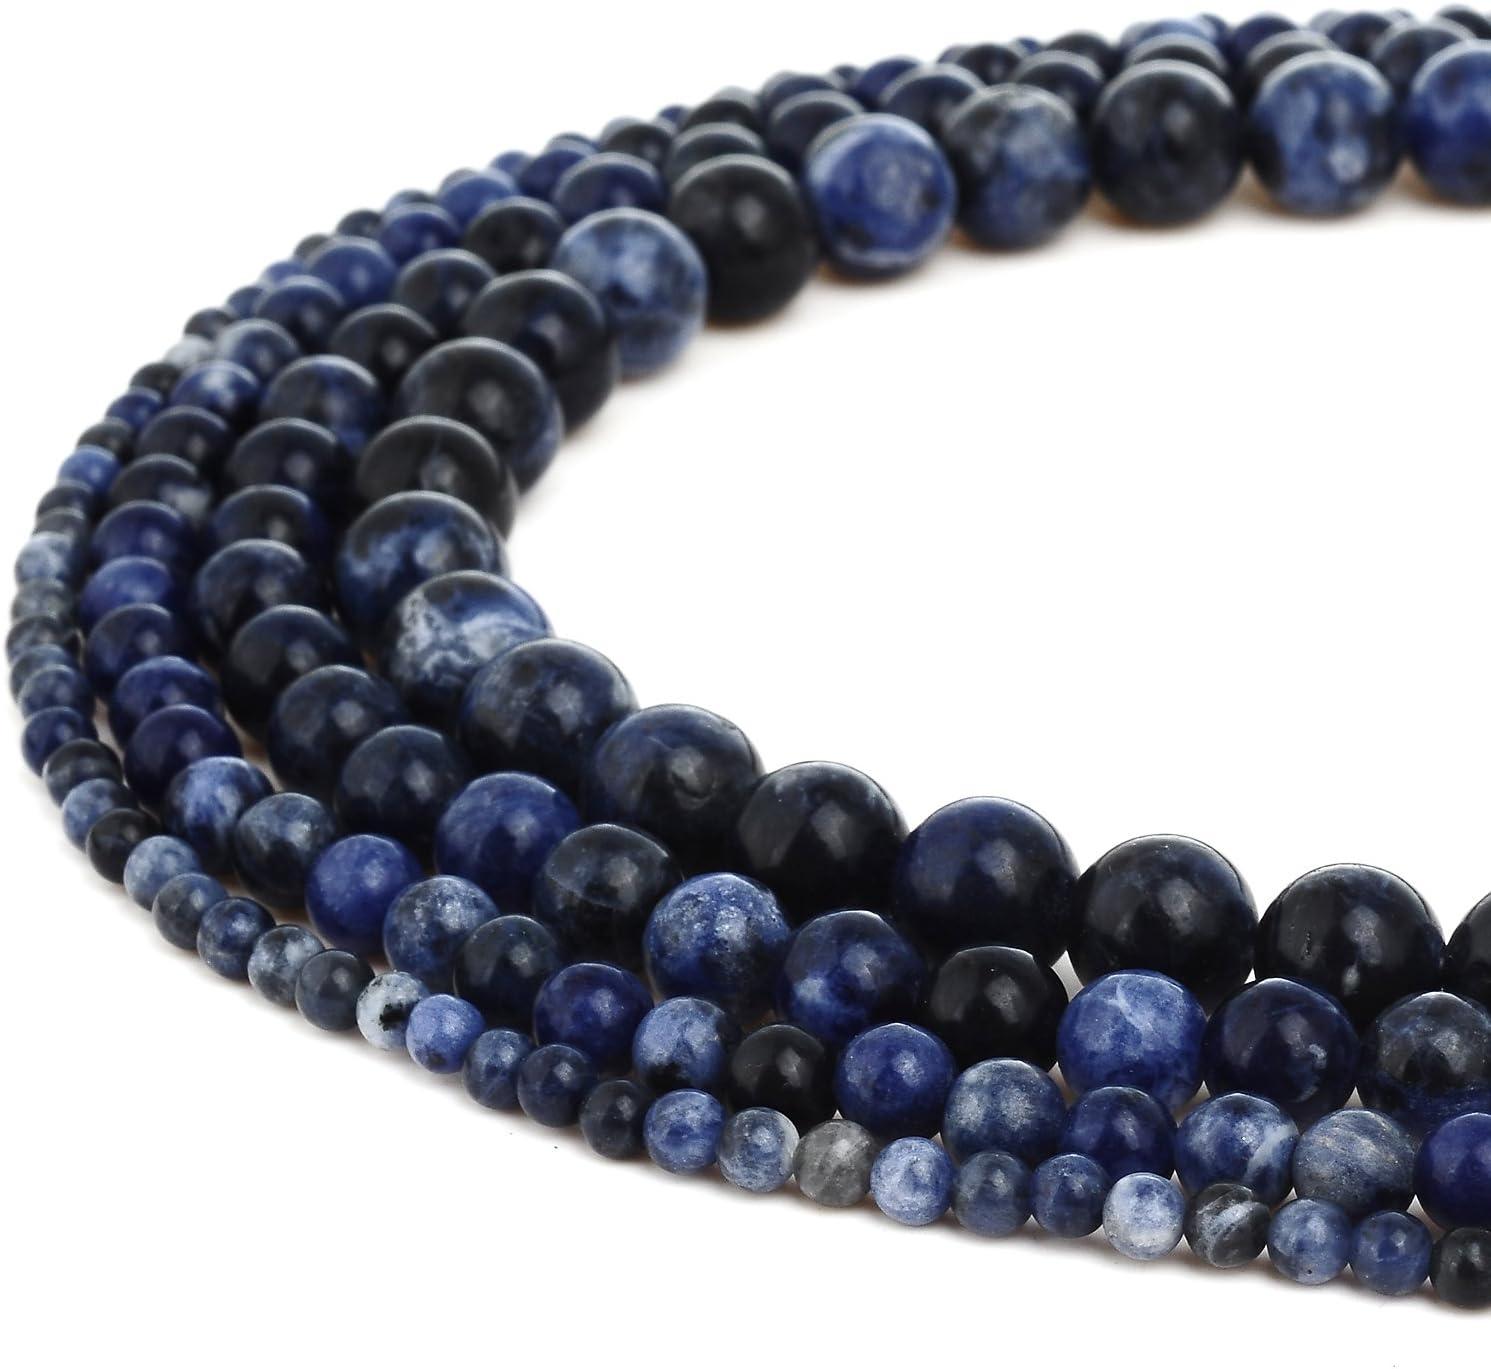 Veined Jasper Round Beads 8mm Grey//Black 8 Pcs Gemstones Jewellery Making Crafts